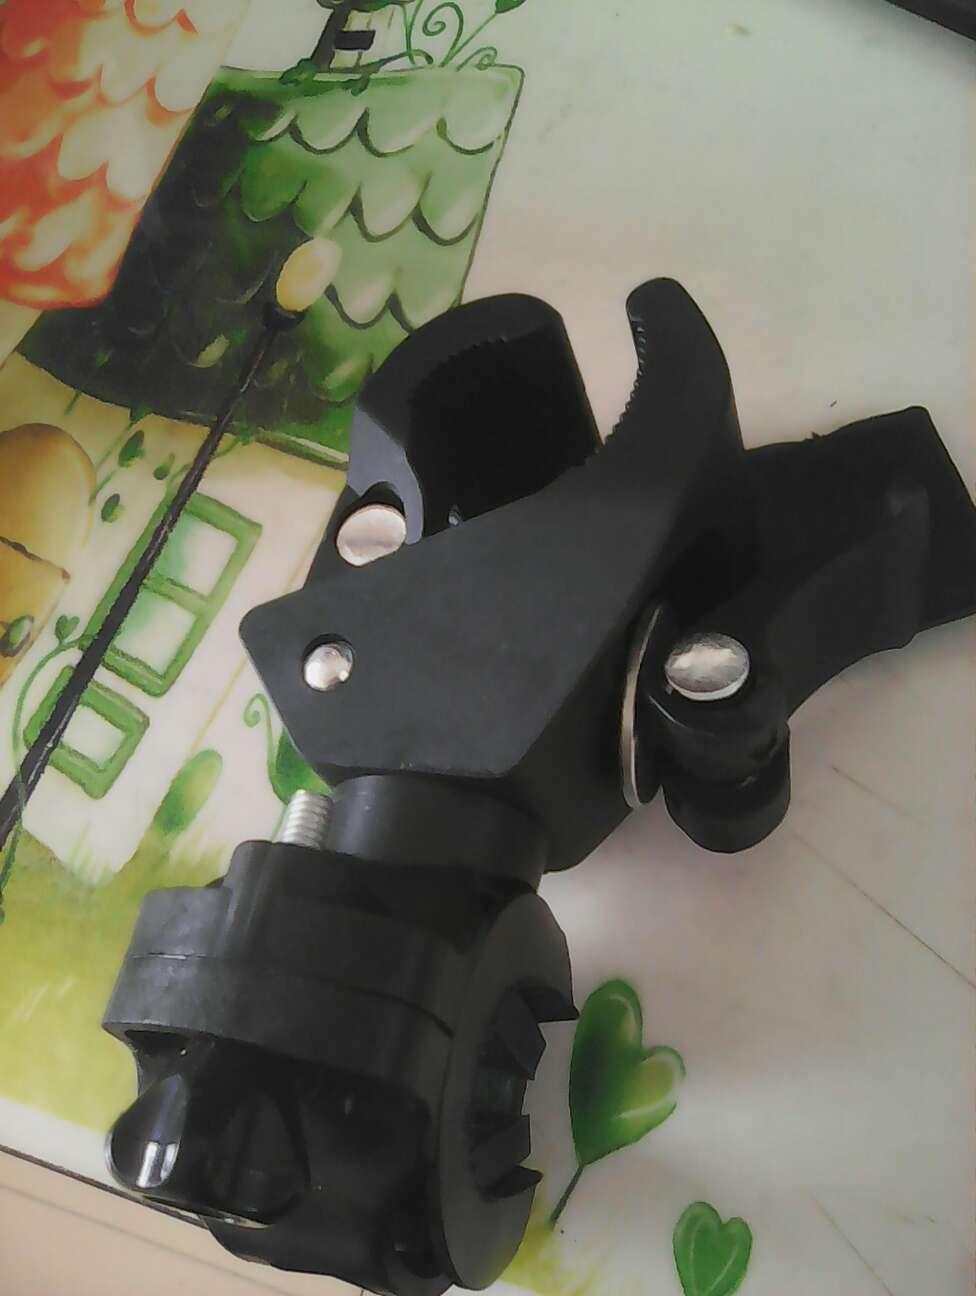 asics factory outlet birkenhead point reviews 00287303 outletonlineshop